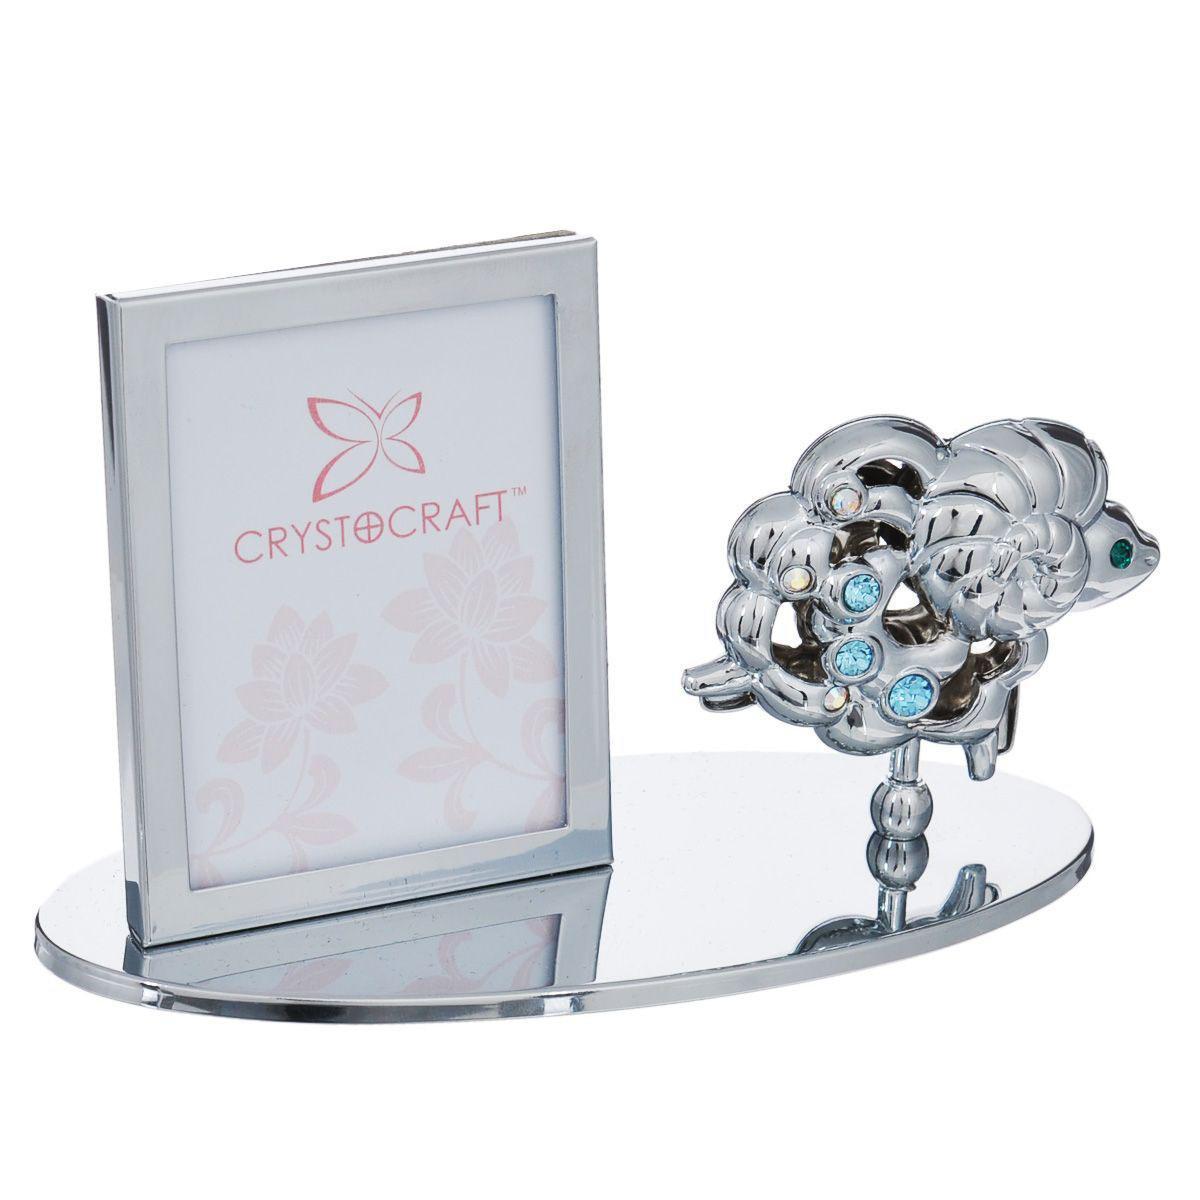 Фоторамка Crystocraft Овечка, цвет: серебристый, 4,5 х 5,5 см статуэтка crystocraft миниатюра u0314 001 cbl